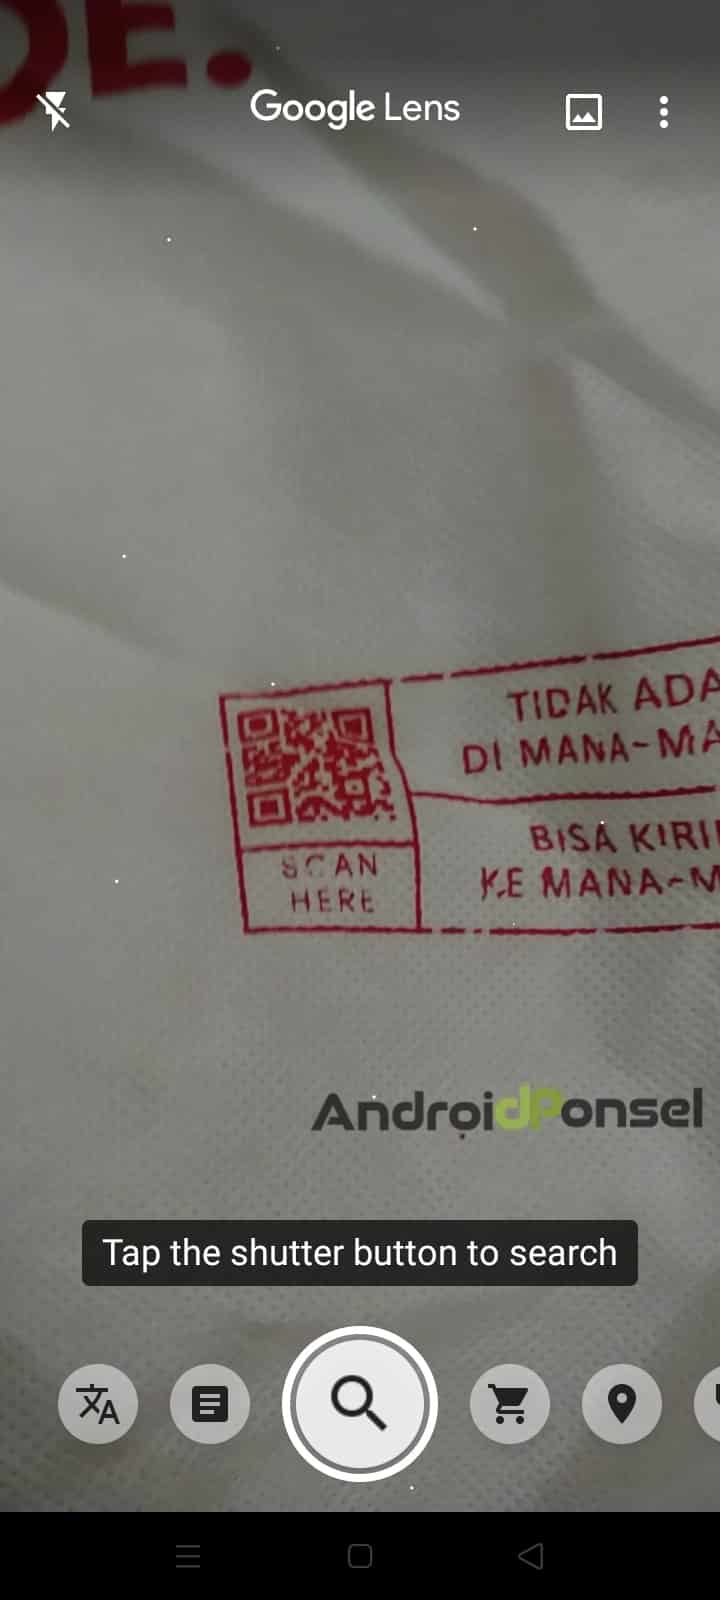 Cara Scan Barcode pada Handphone Android